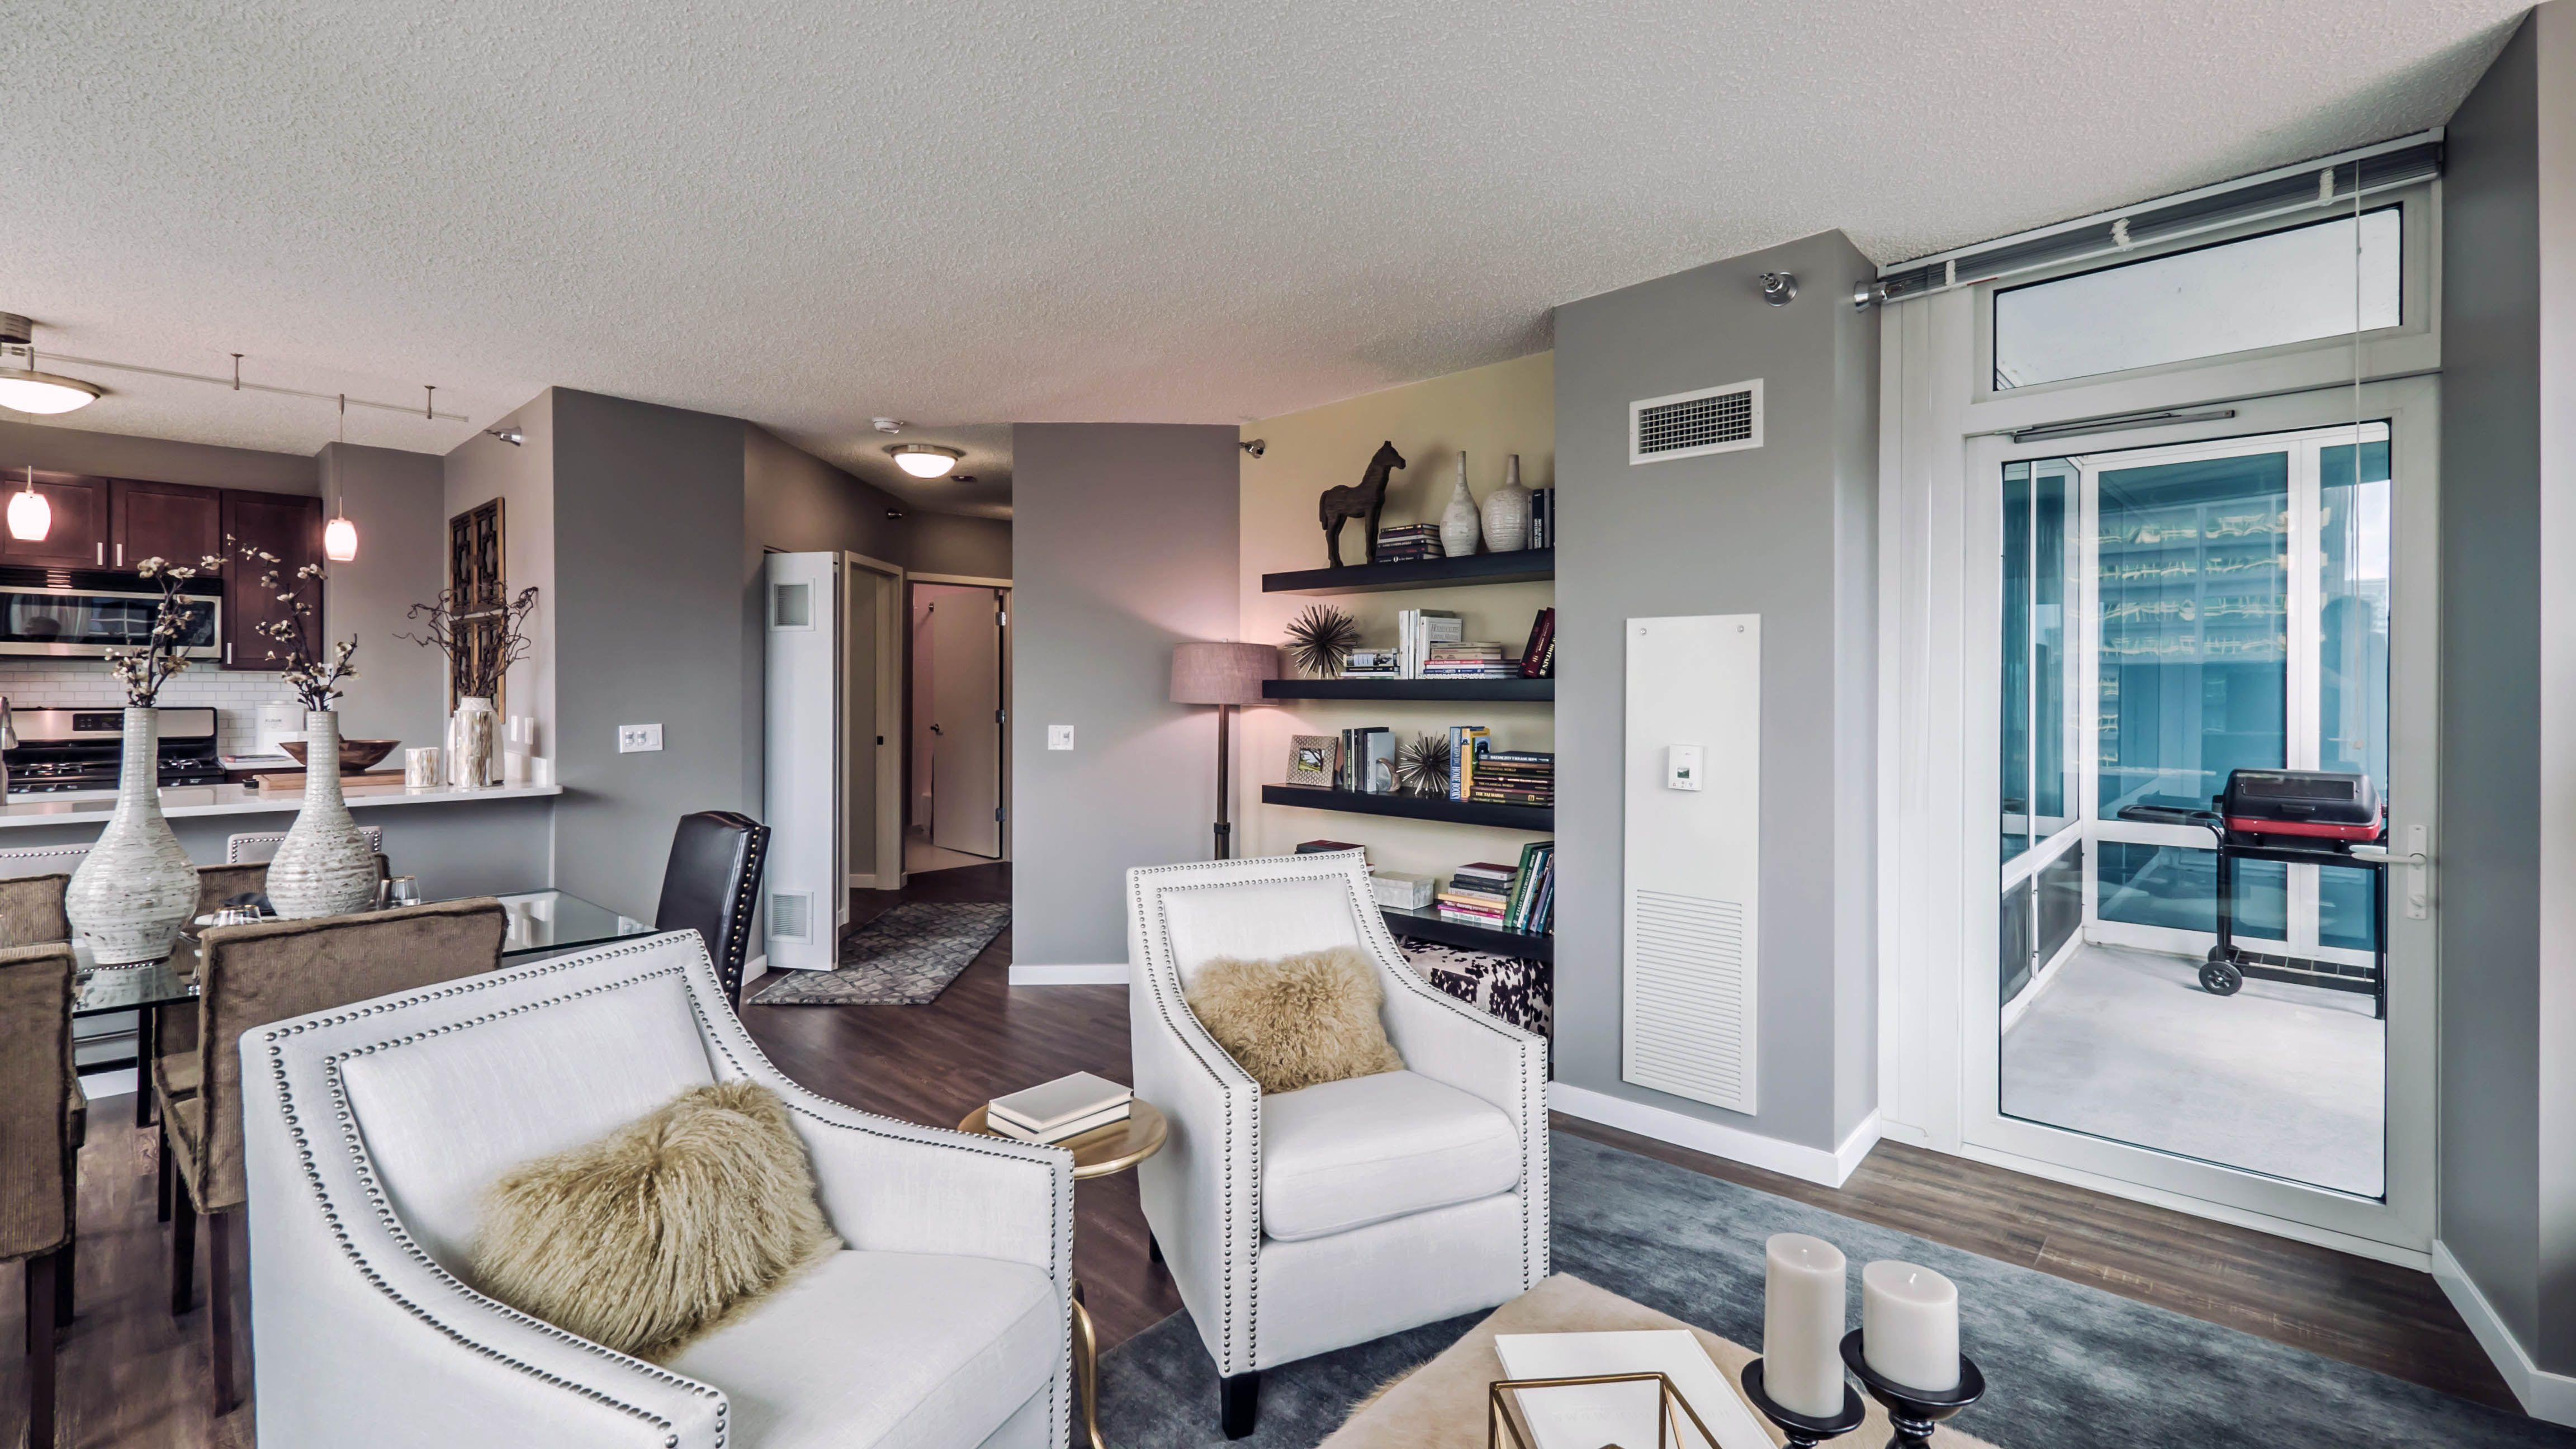 Atwater Apartment, Chicago apartment, Luxury apartments